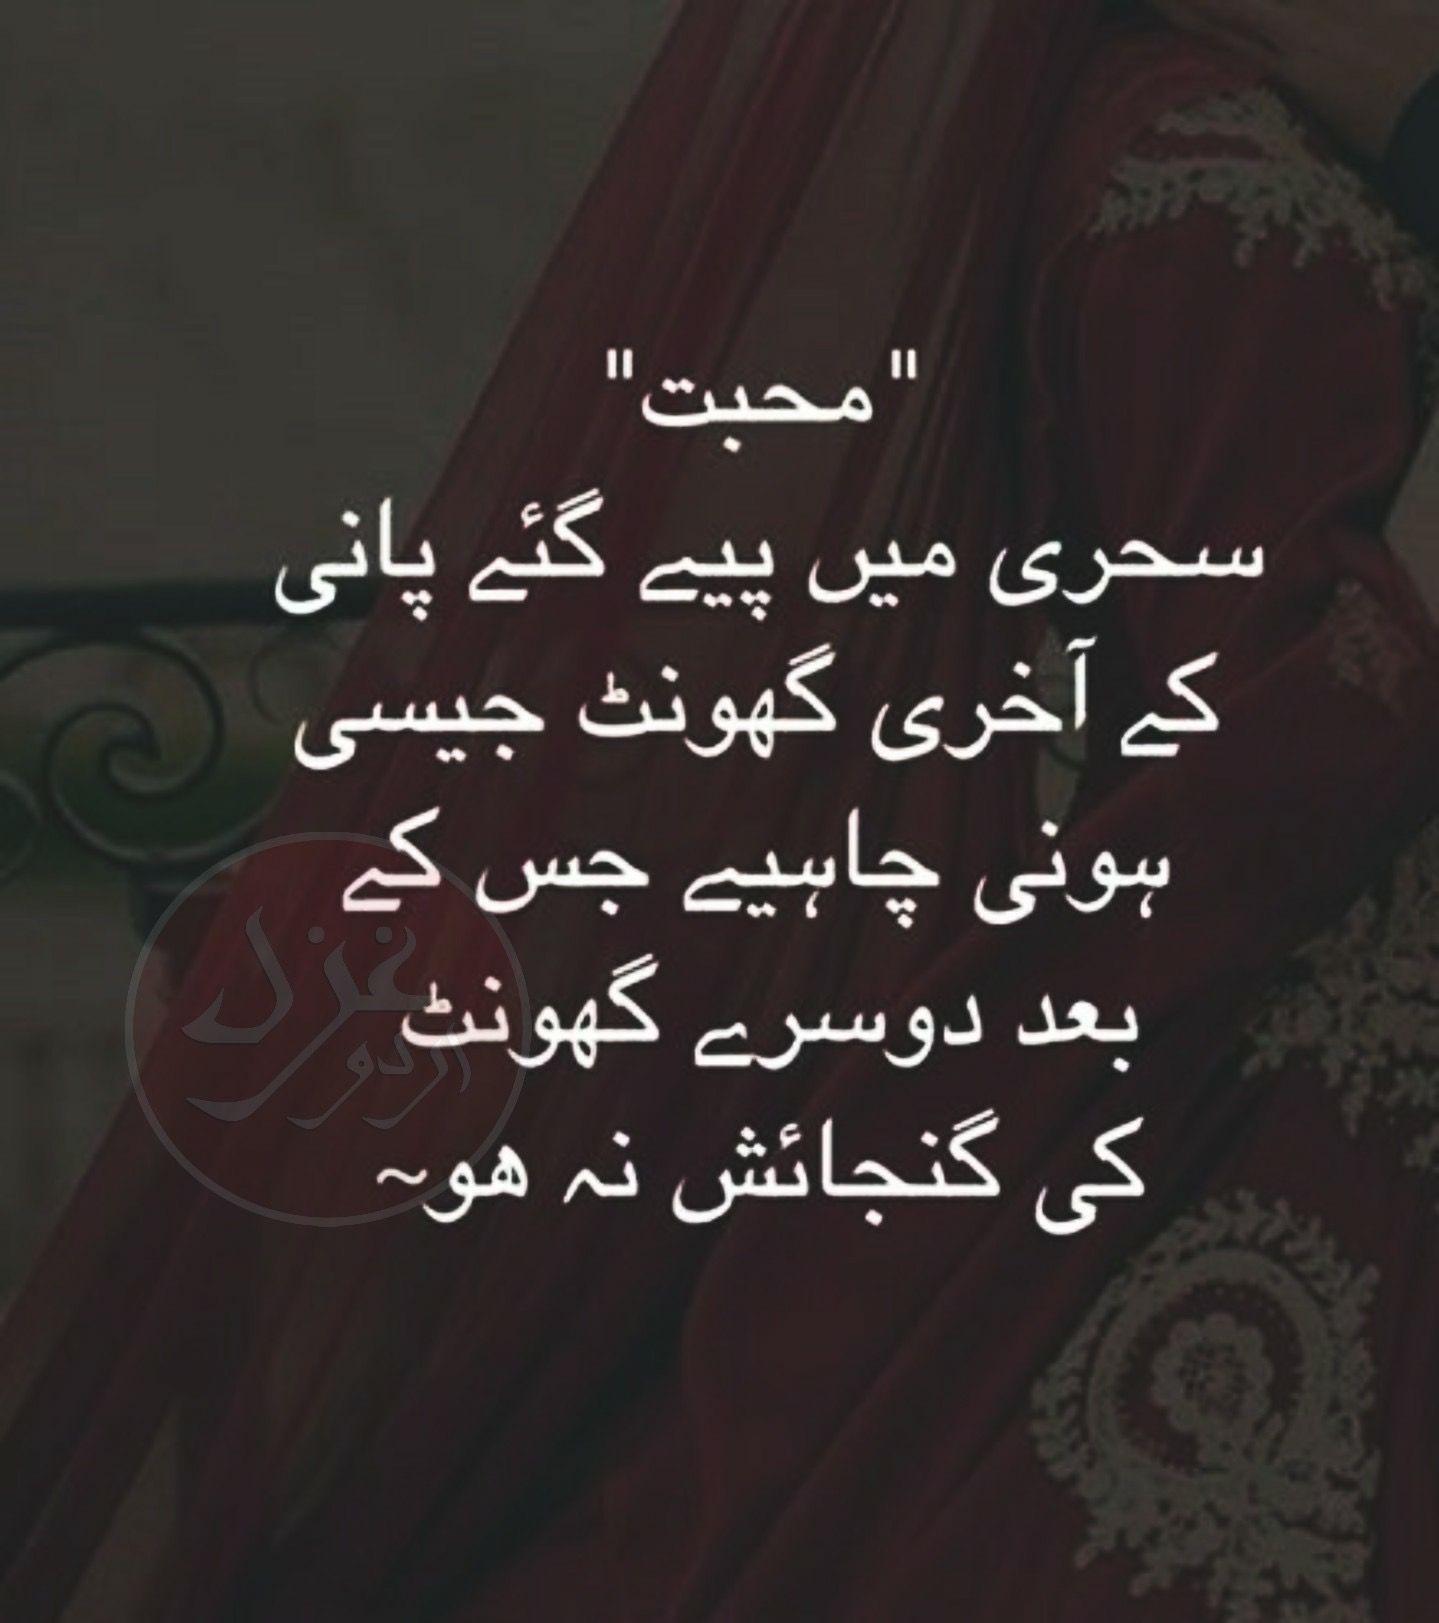 Quotes In Urdu: Urdu Quotes, Urdu Poetry